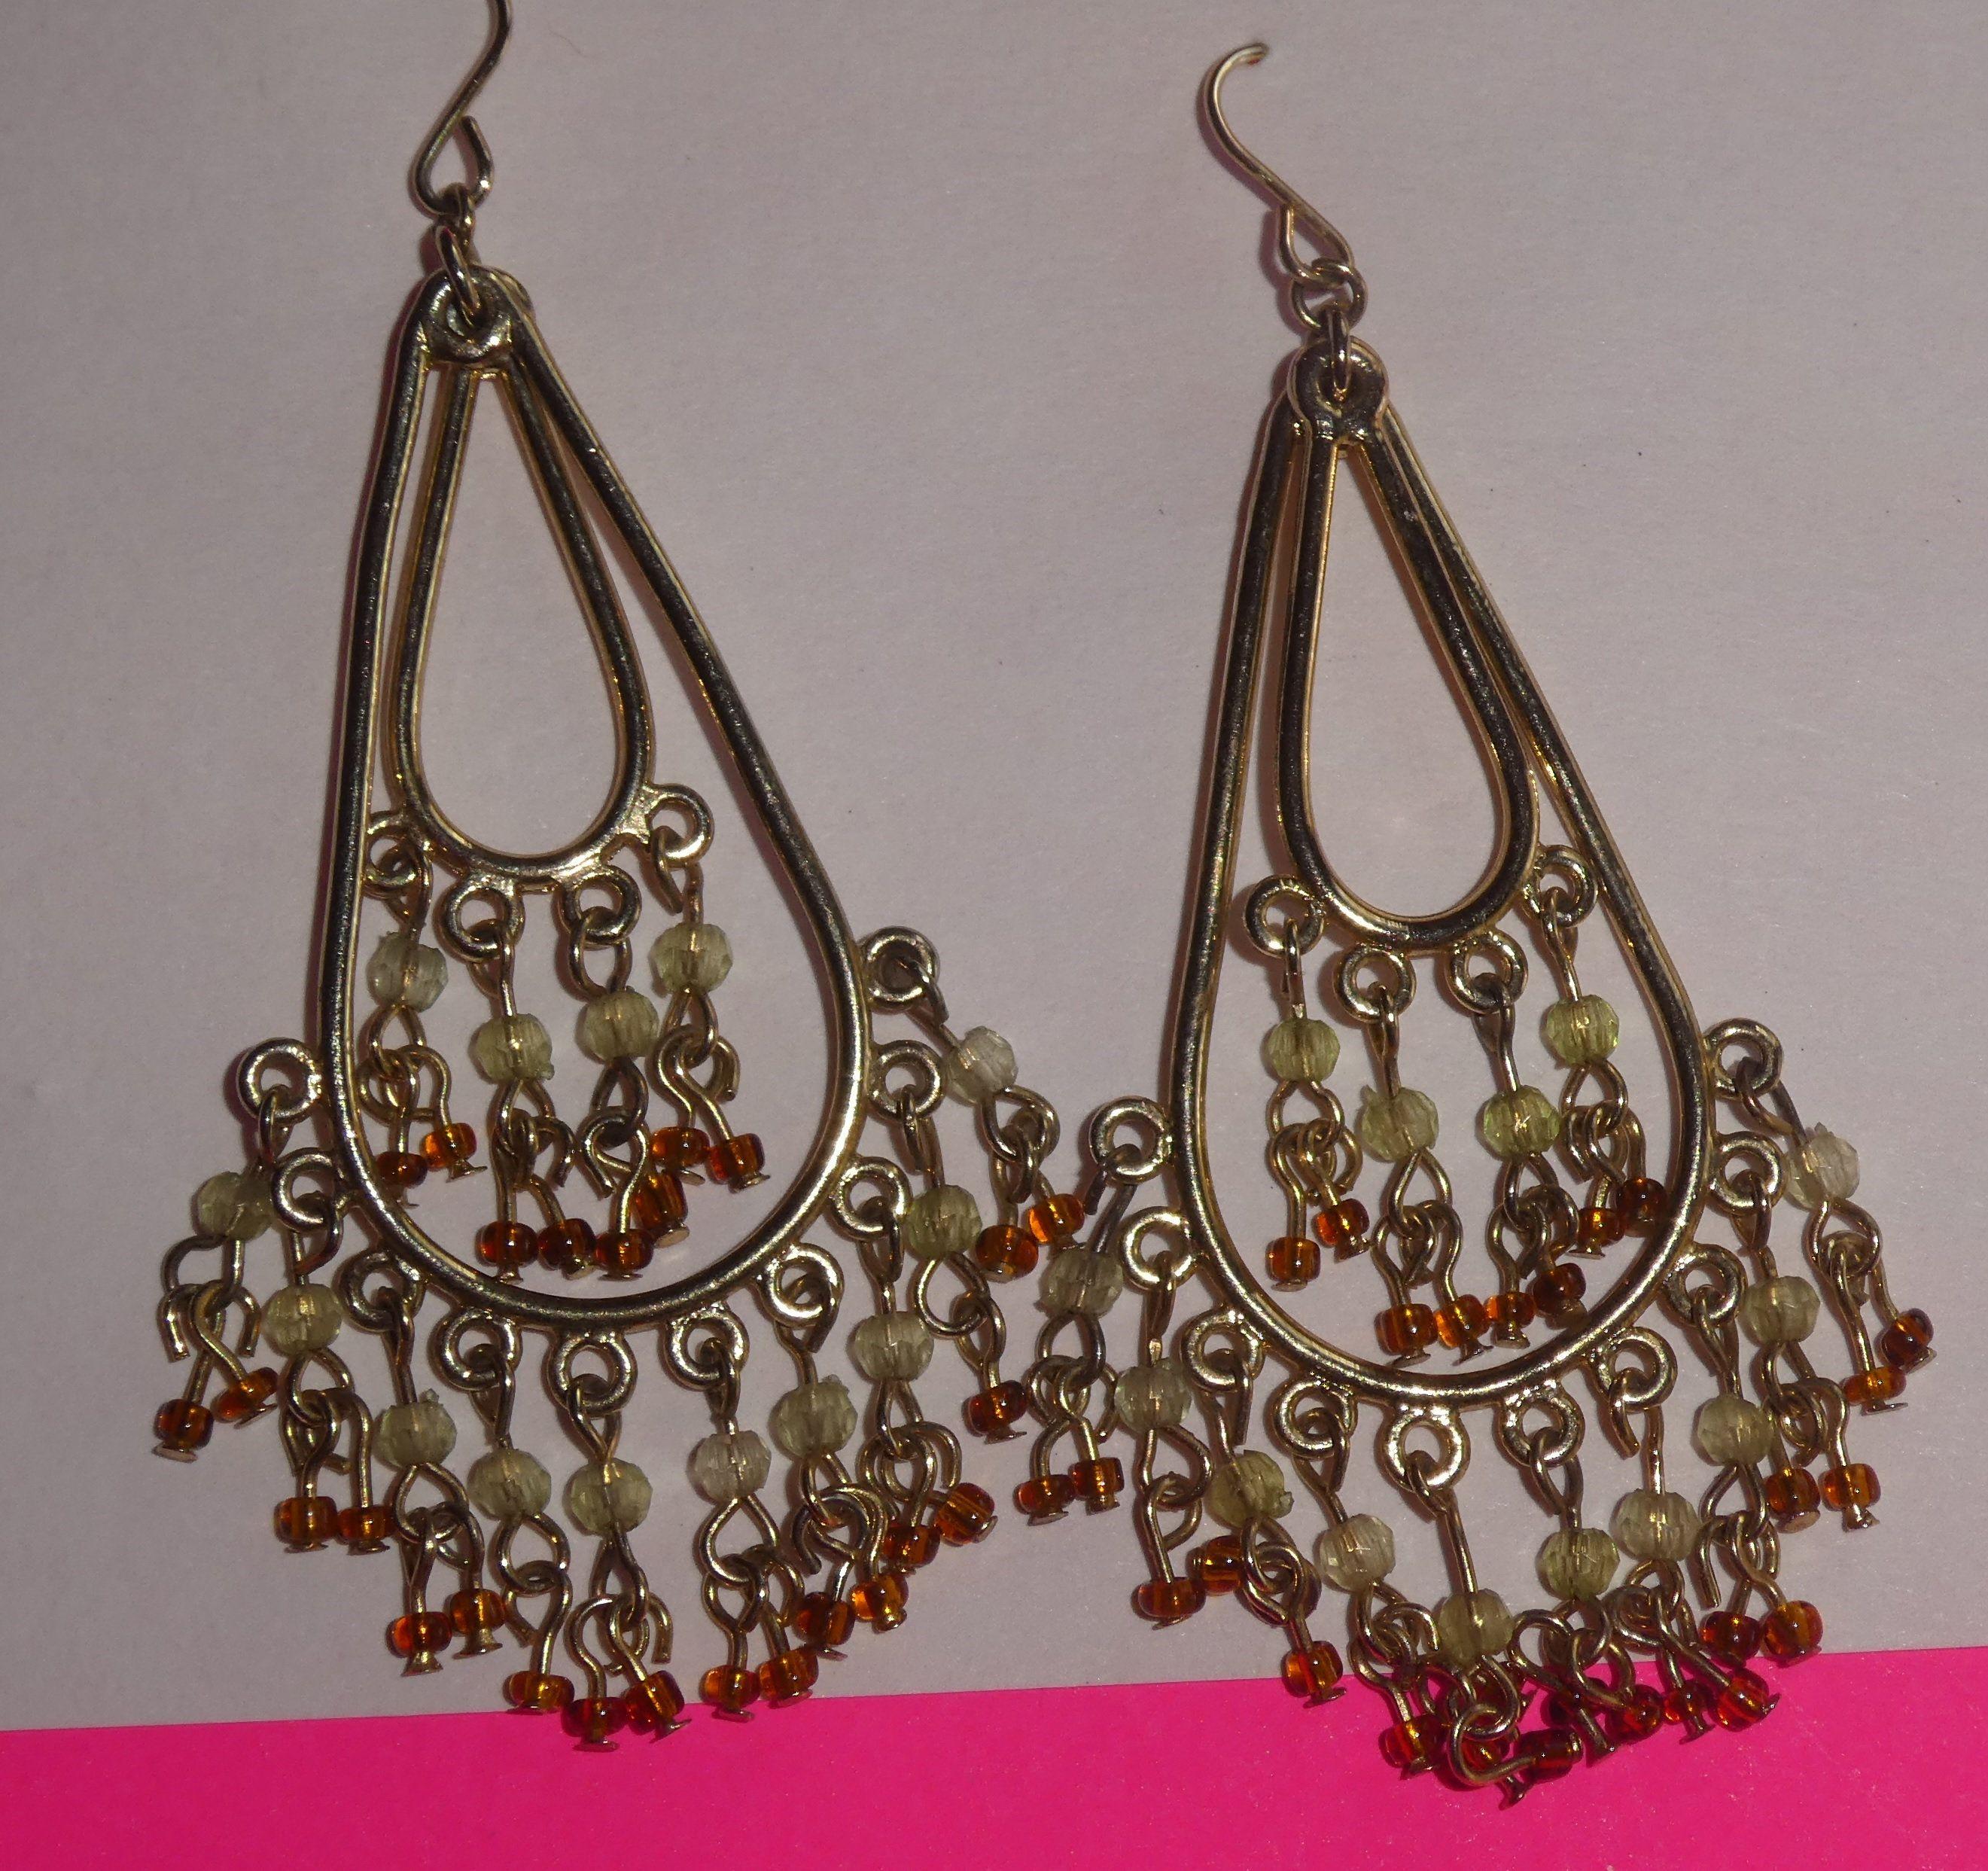 1970's -jewelry dangle-pierced earrings-gold metal-Jewelry-Free Shipping-costume jewelry-Birthday-stocking stuffer-xmas-Hanukkah – Kwanzaa